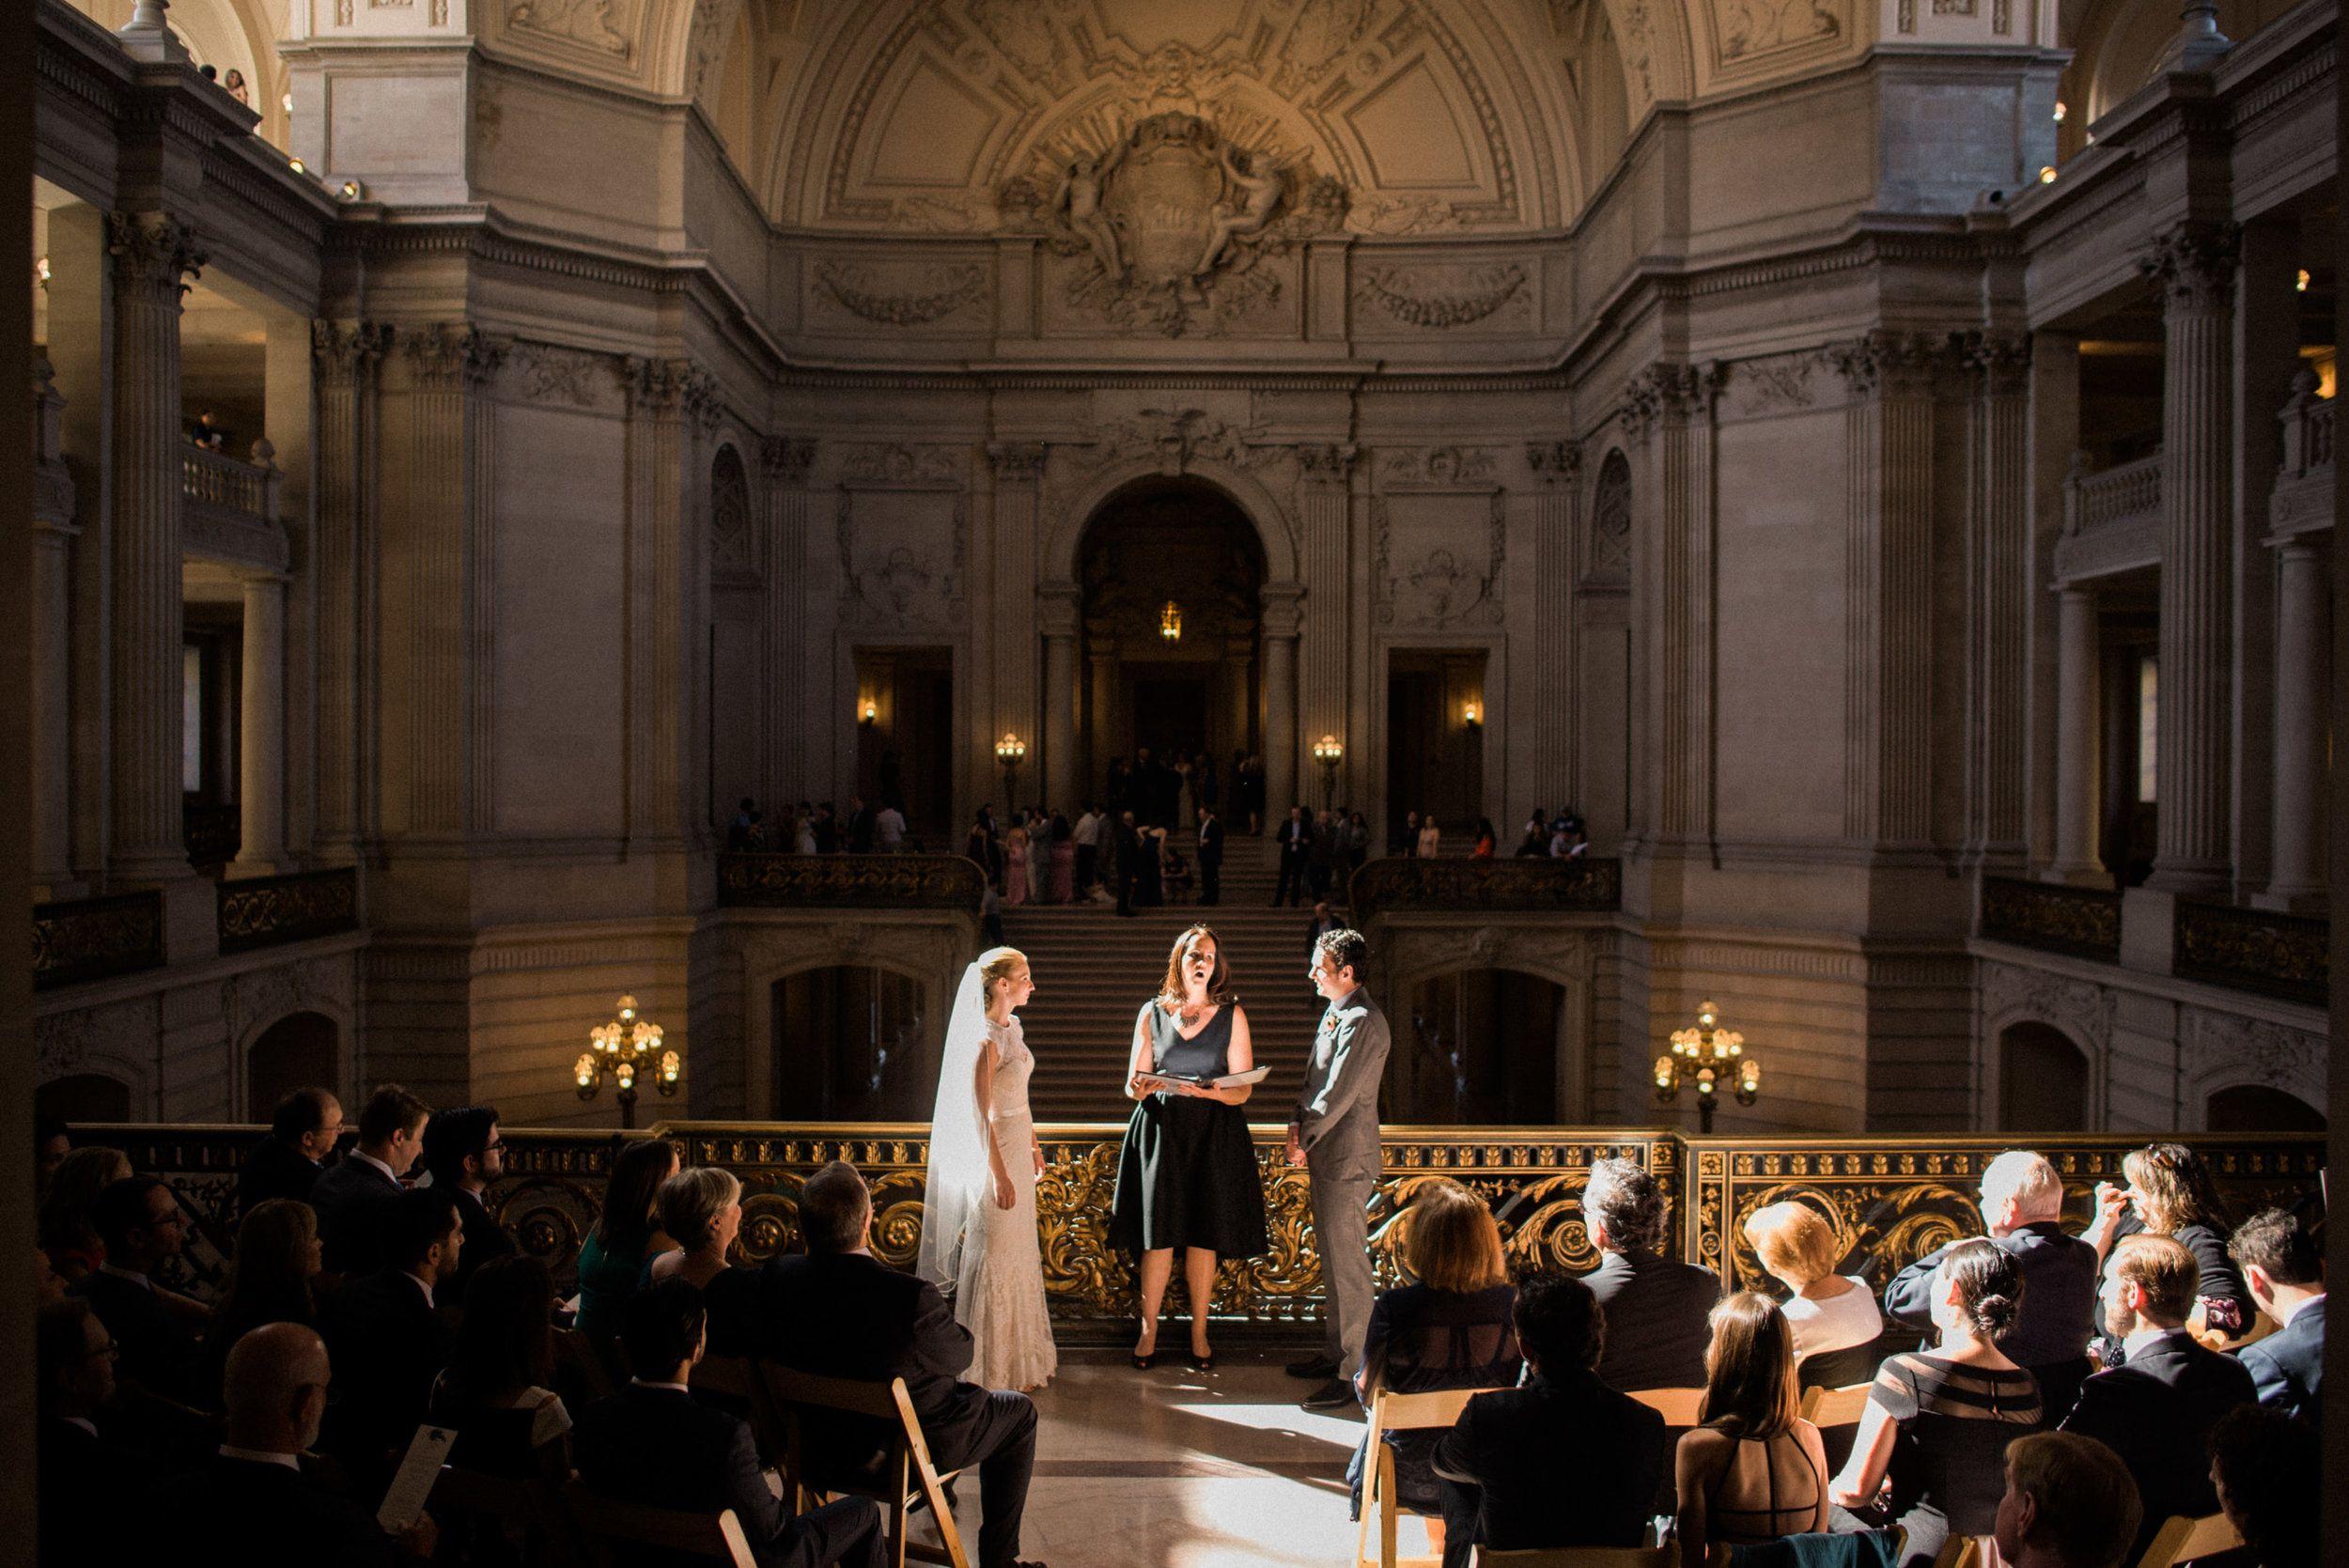 Lisa Tim San Francisco City Cinema Wedding Documentary Wedding Photography